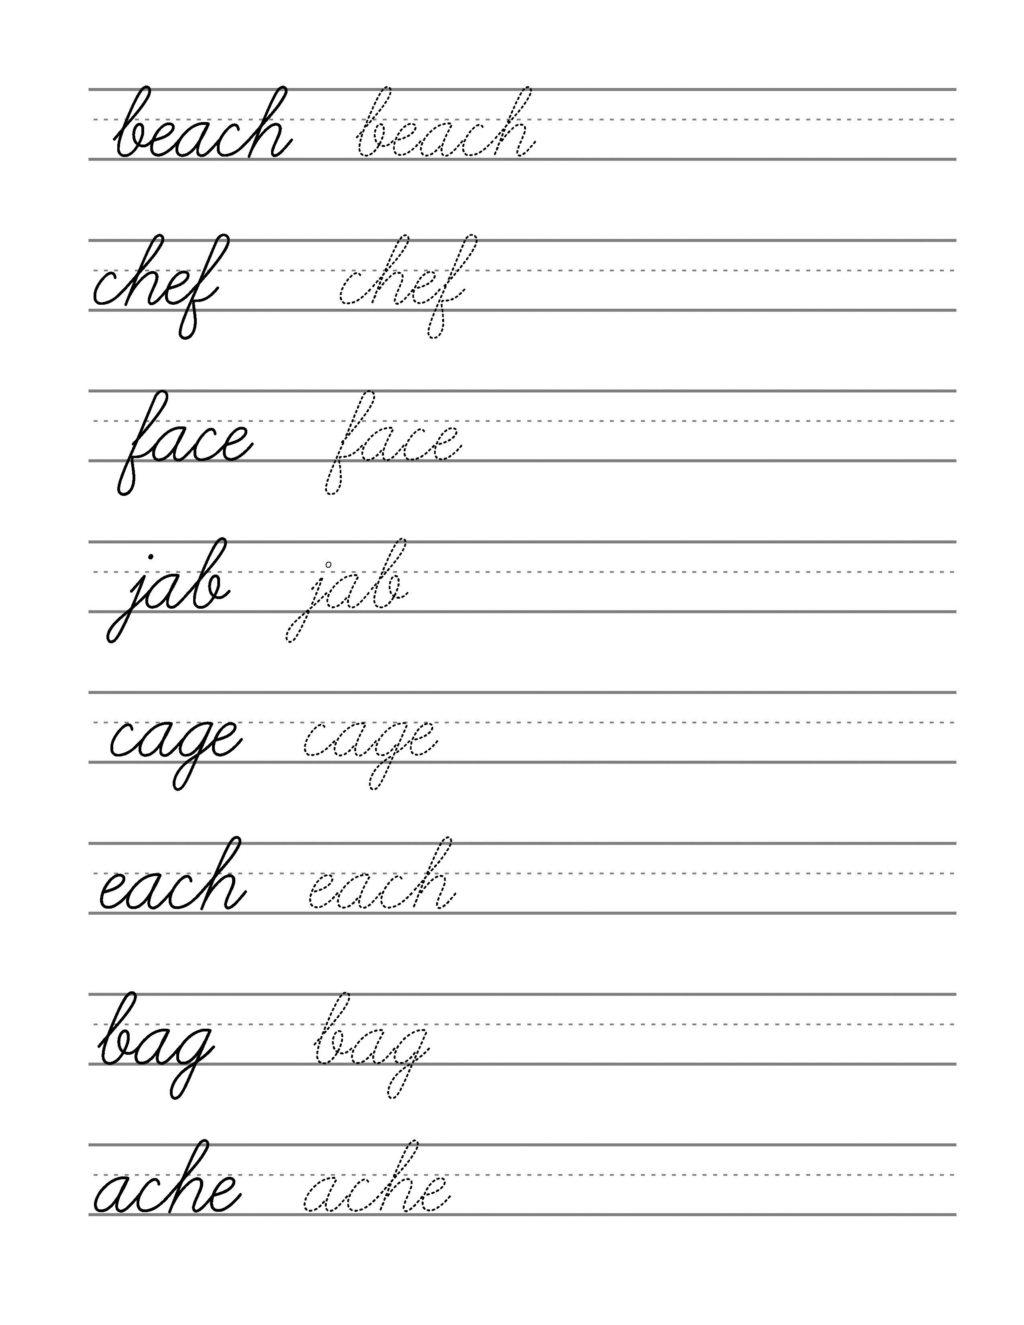 Worksheet ~ Cursive Writing Templates Barka Practice Online